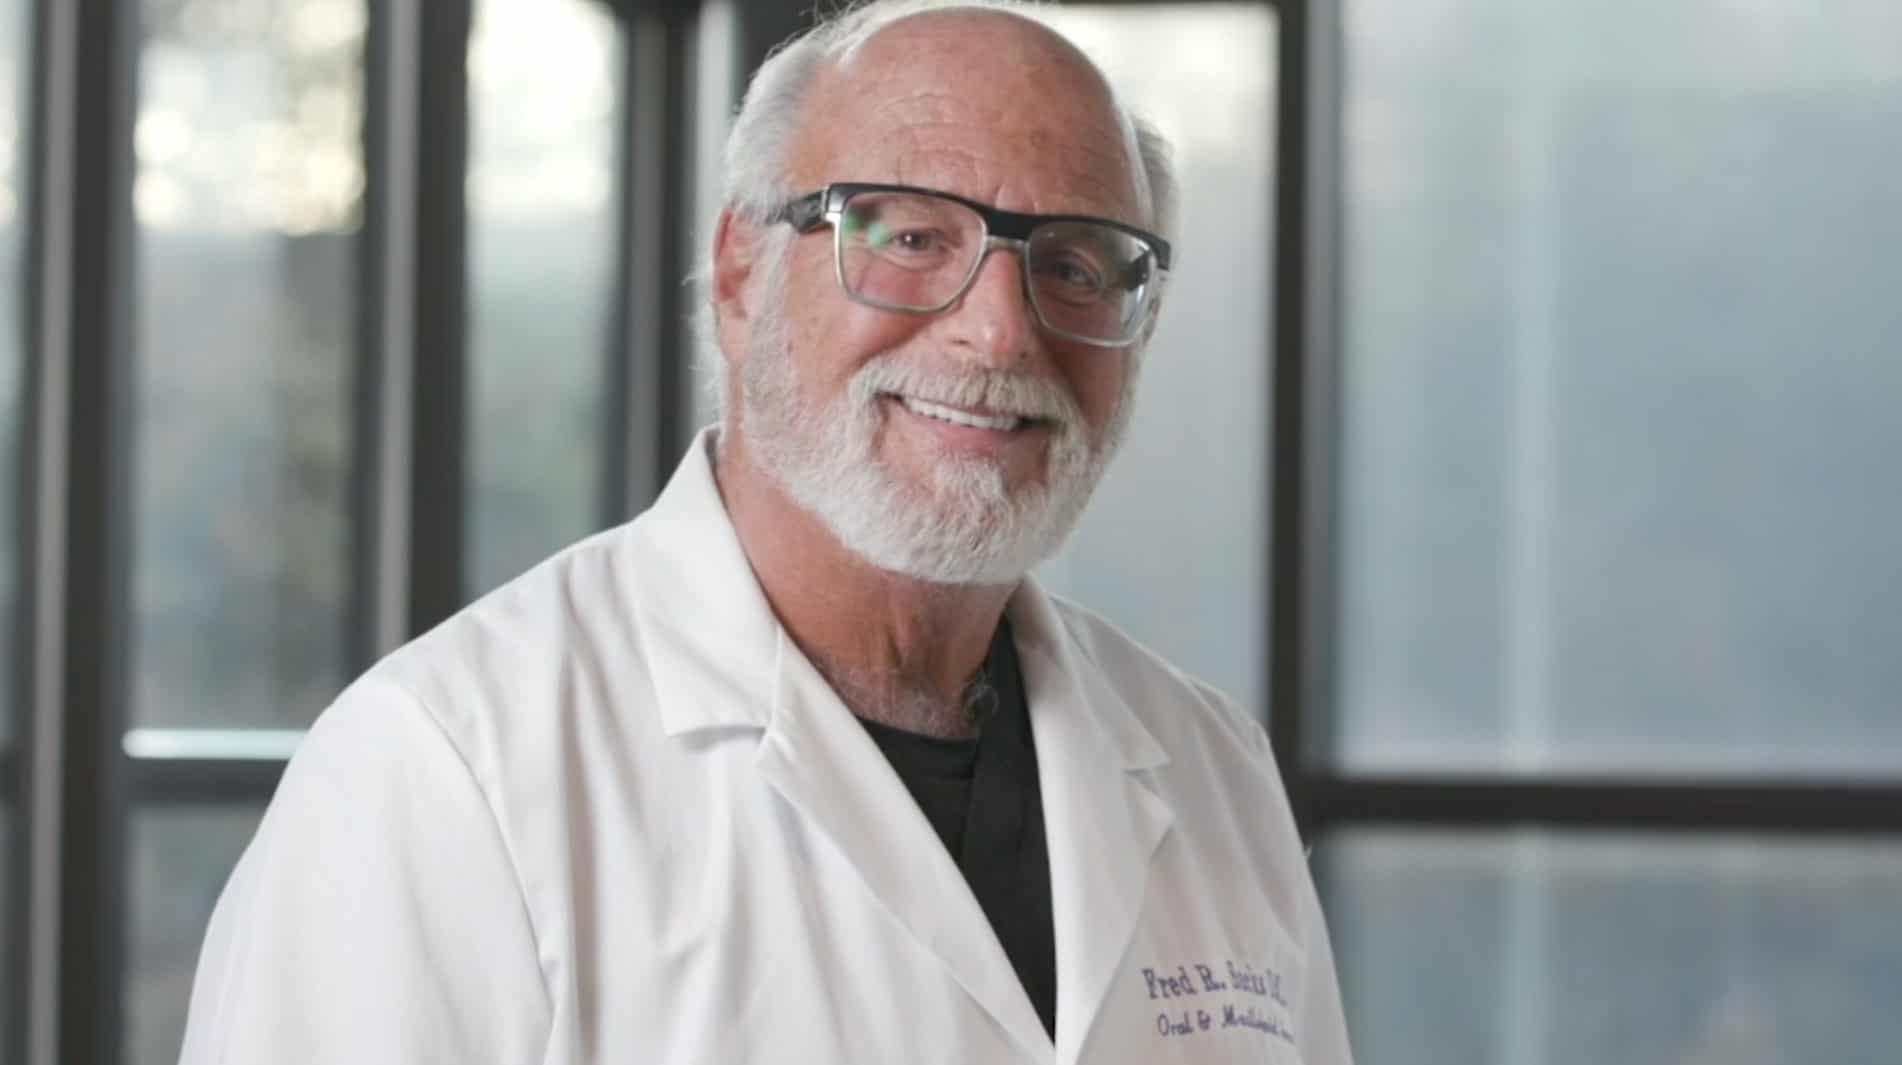 Dr. Fred R. Sacks